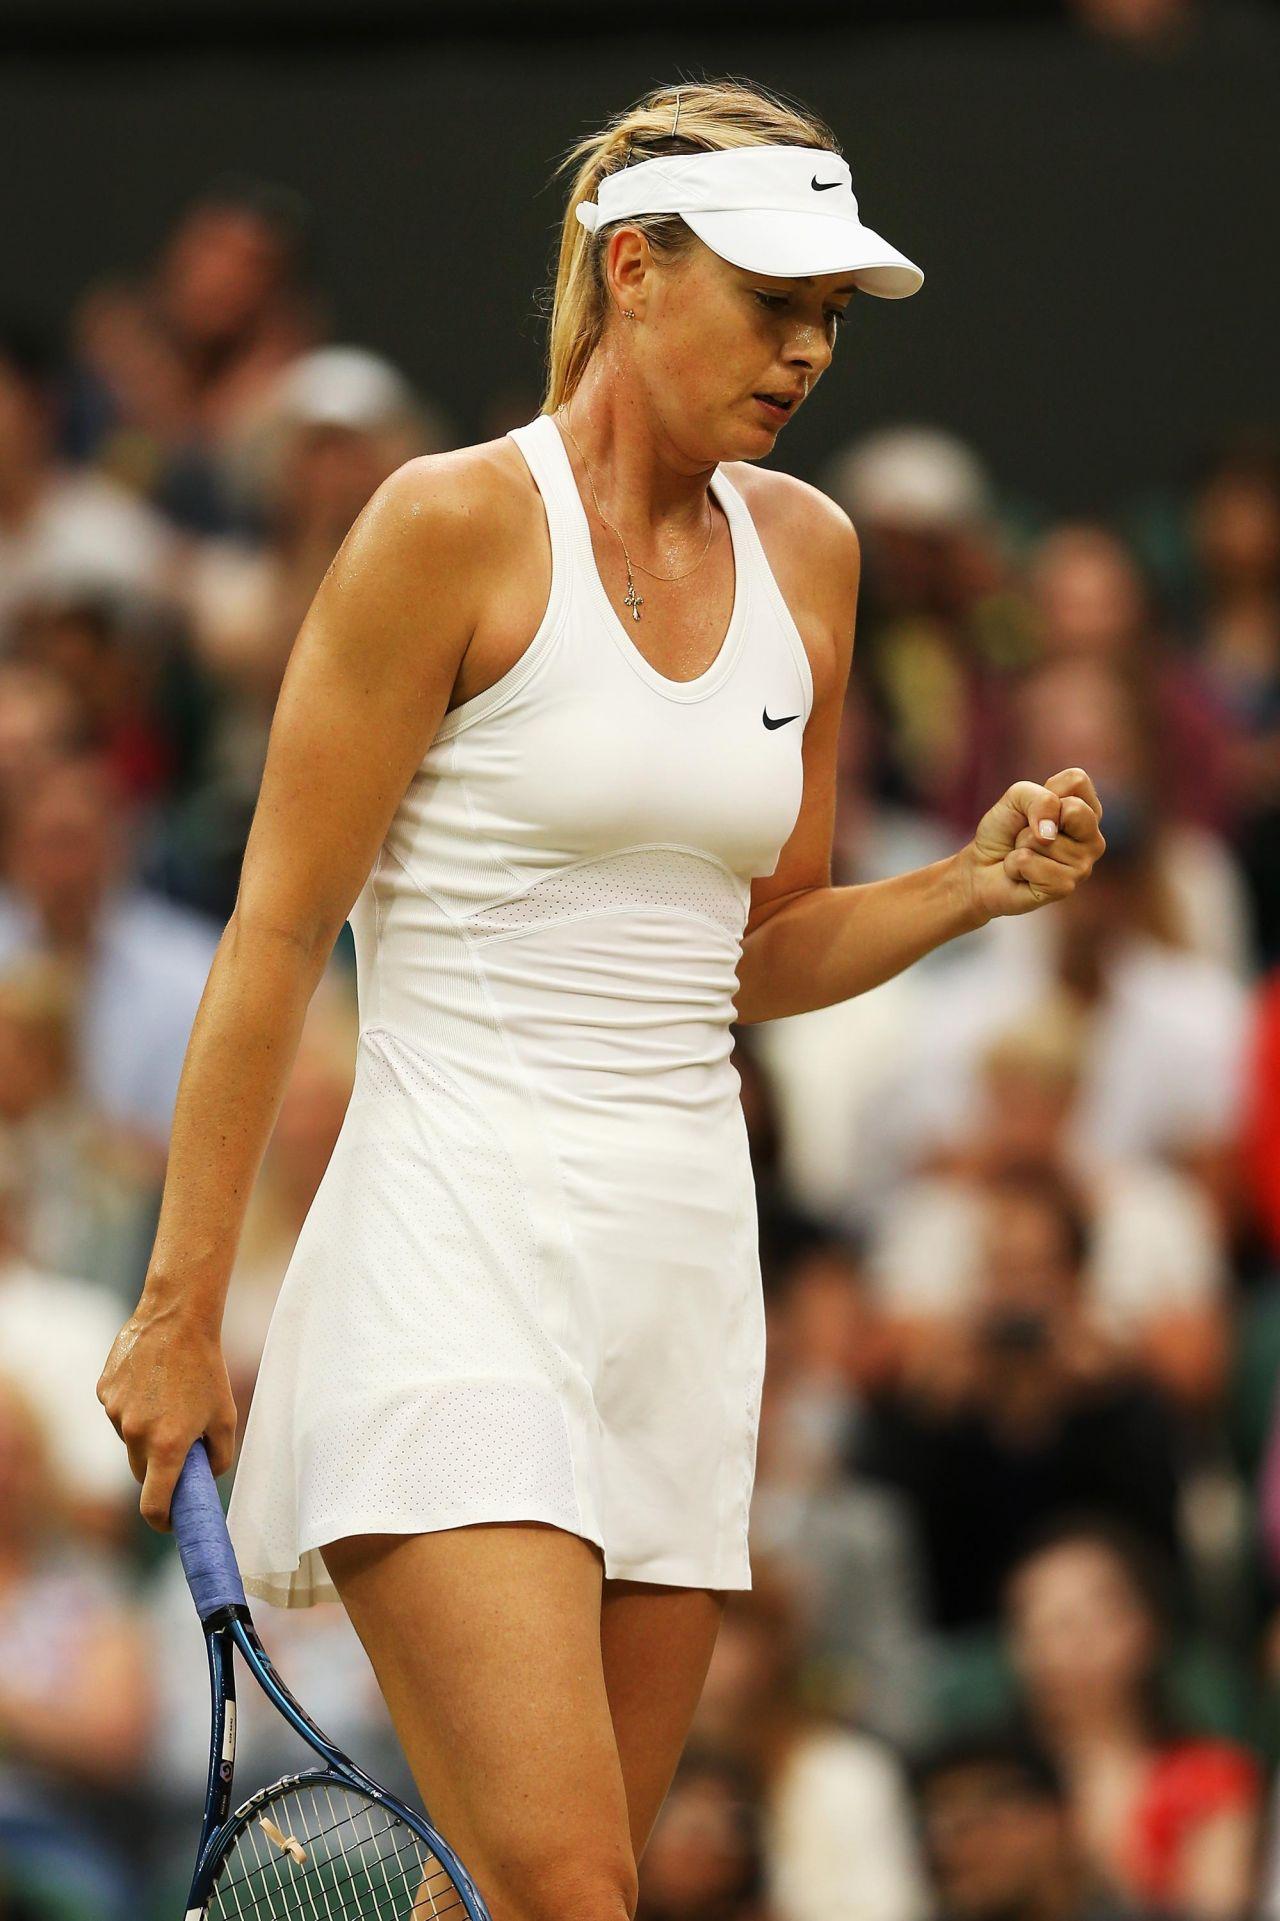 Maria Sharapova shows her 2011 Wimbledon tennis dress.JPG